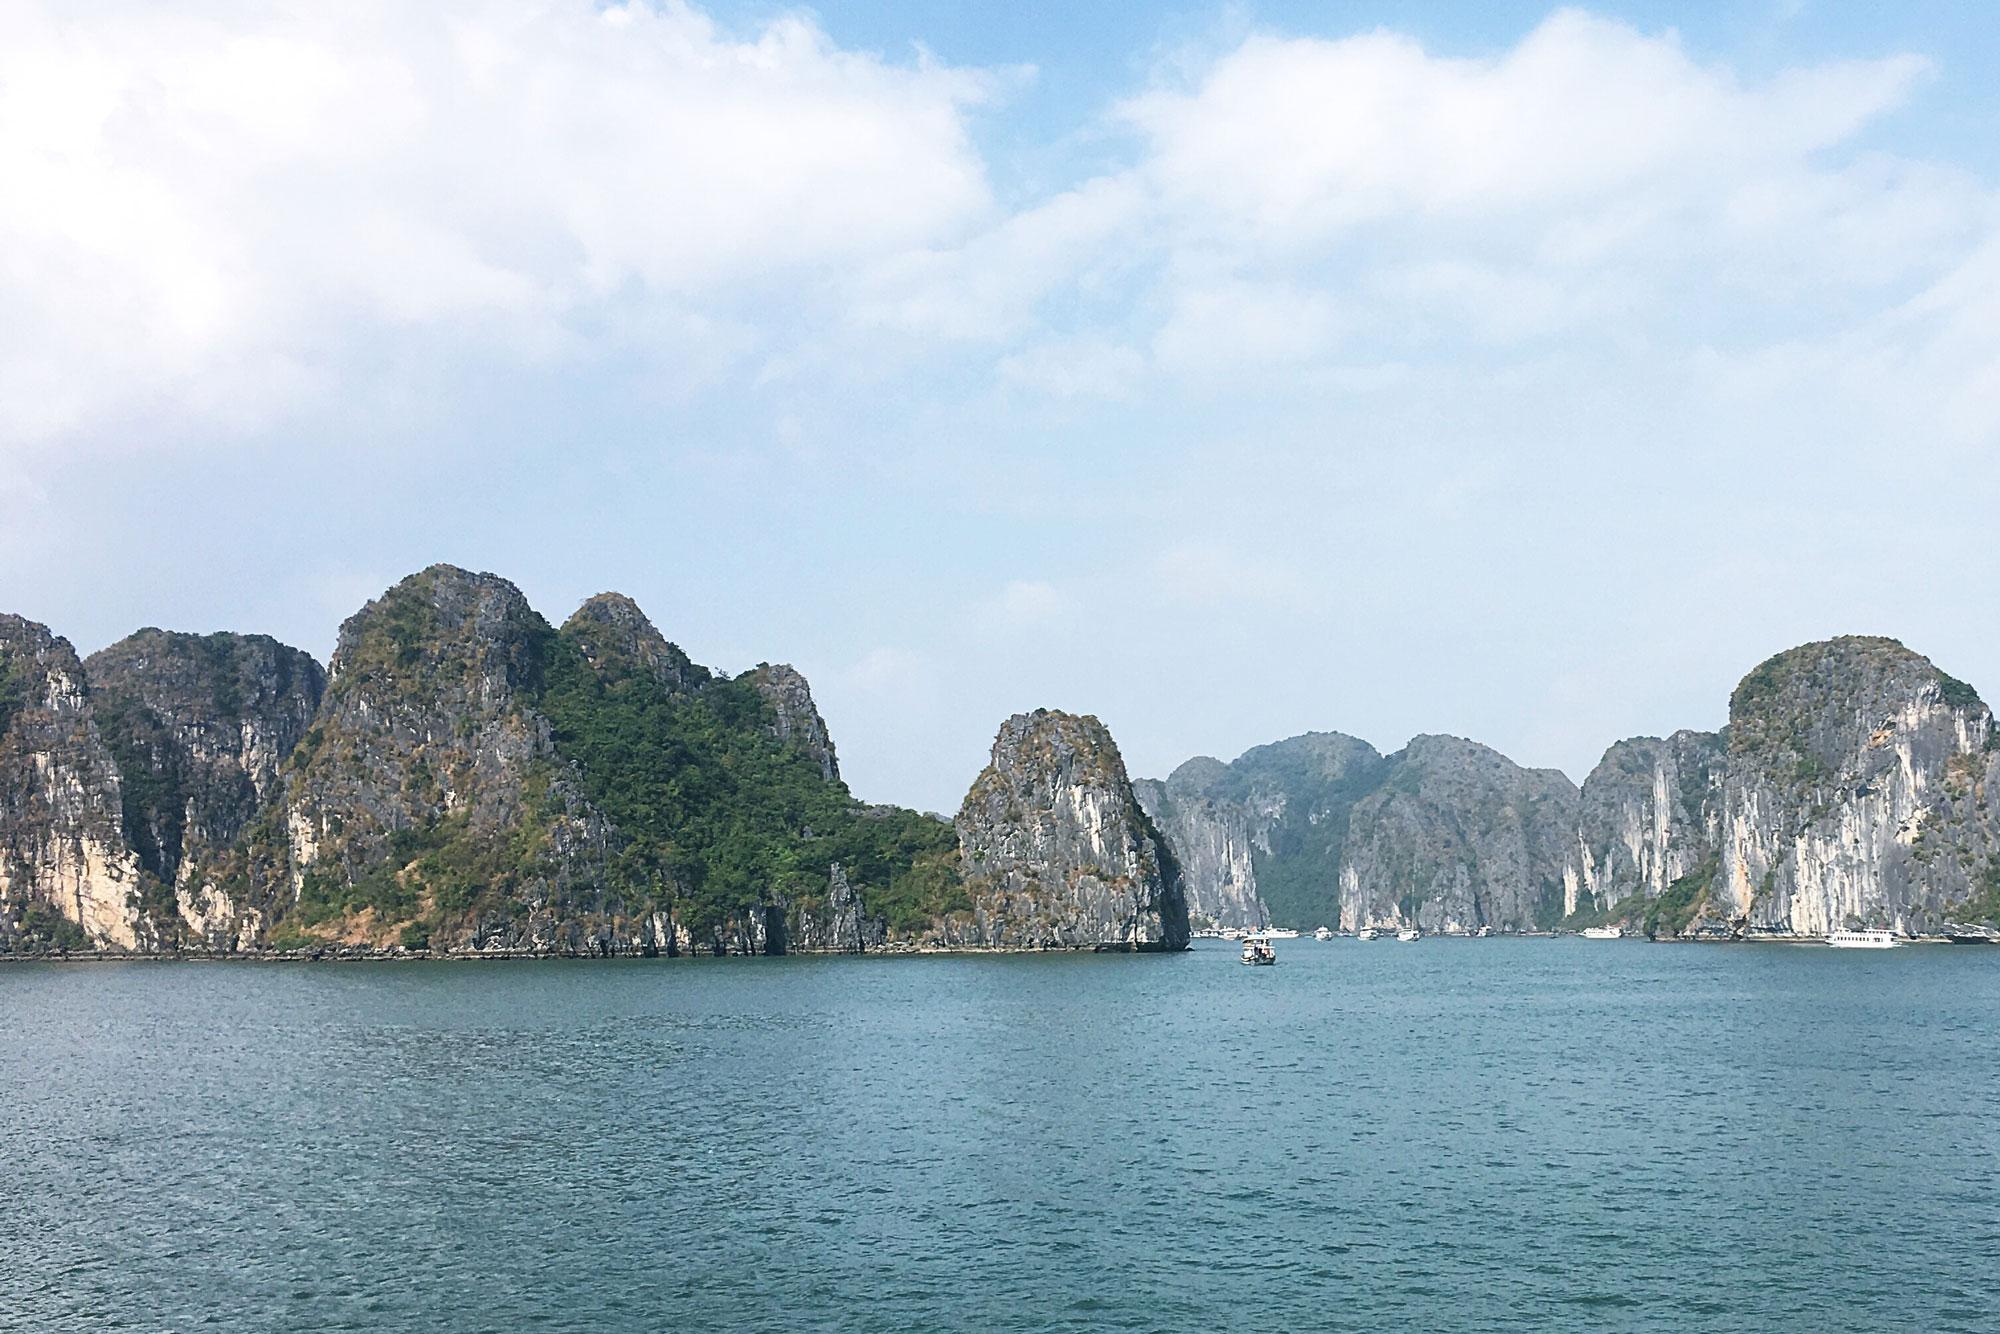 Halong Bay. 6 Days in Vietnam